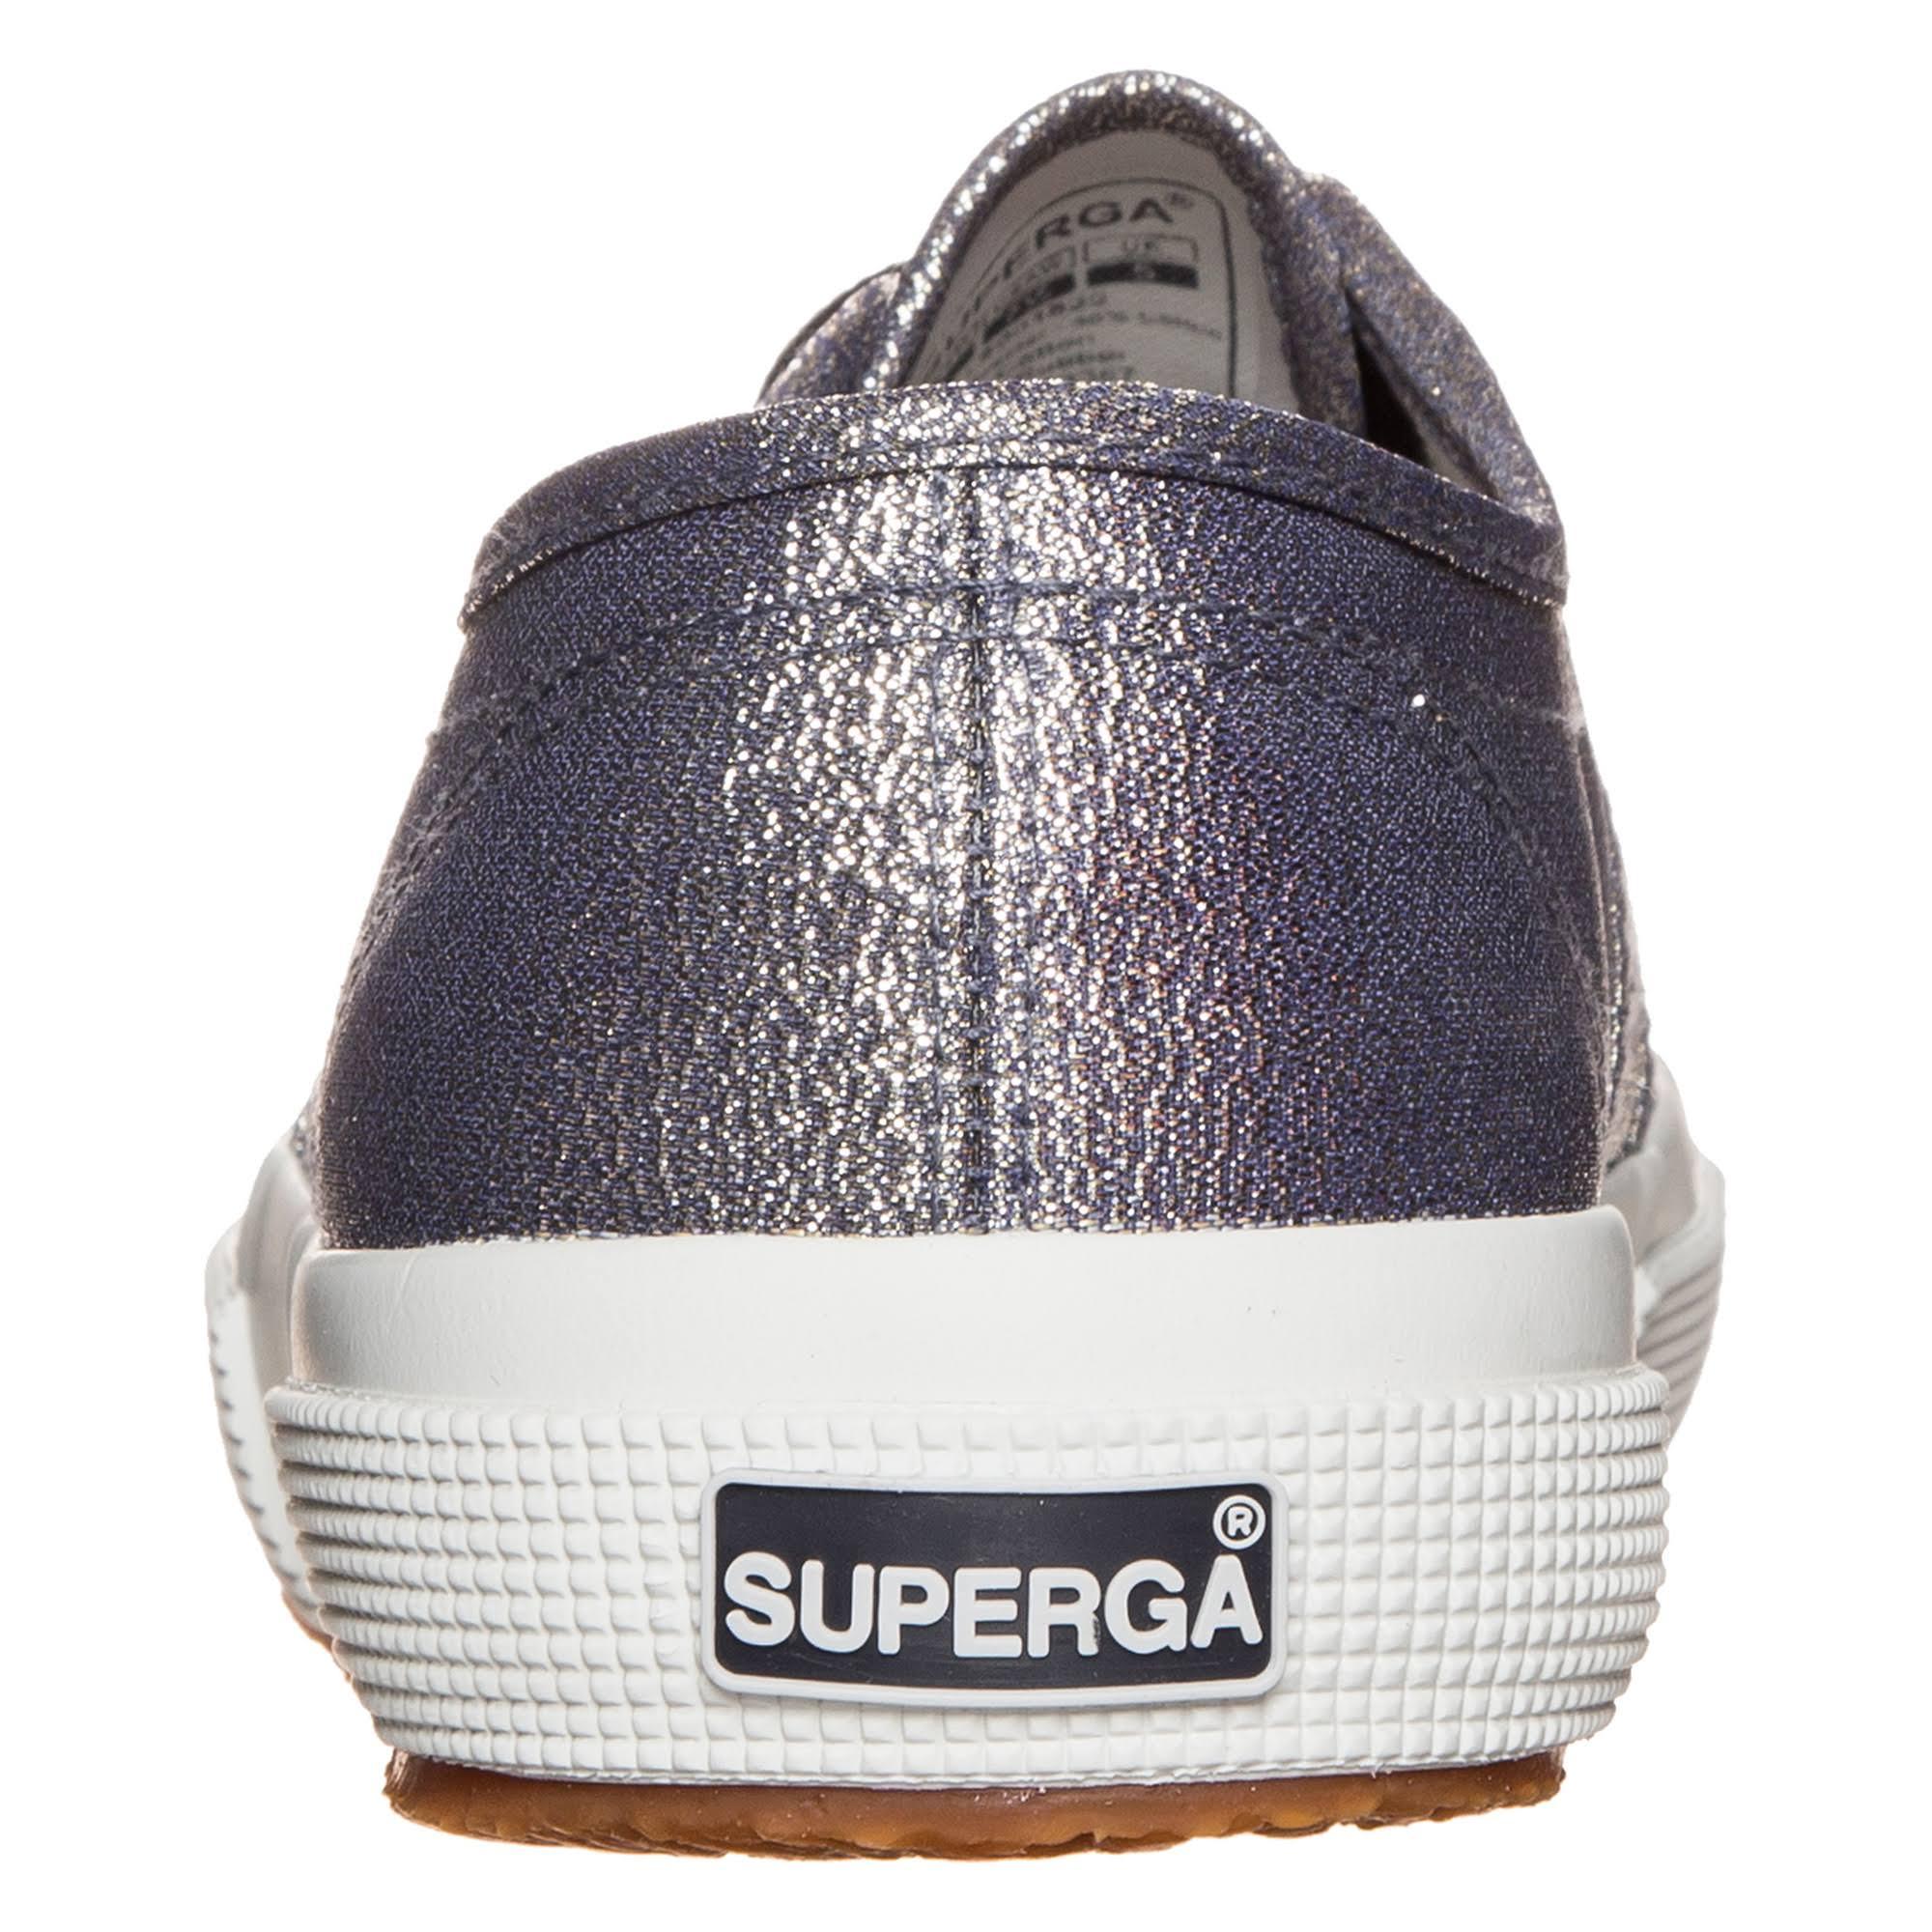 39 Lamew 5 5 Damen Uk 0 2750 Superga Größe Eu Sneaker FSRR8q